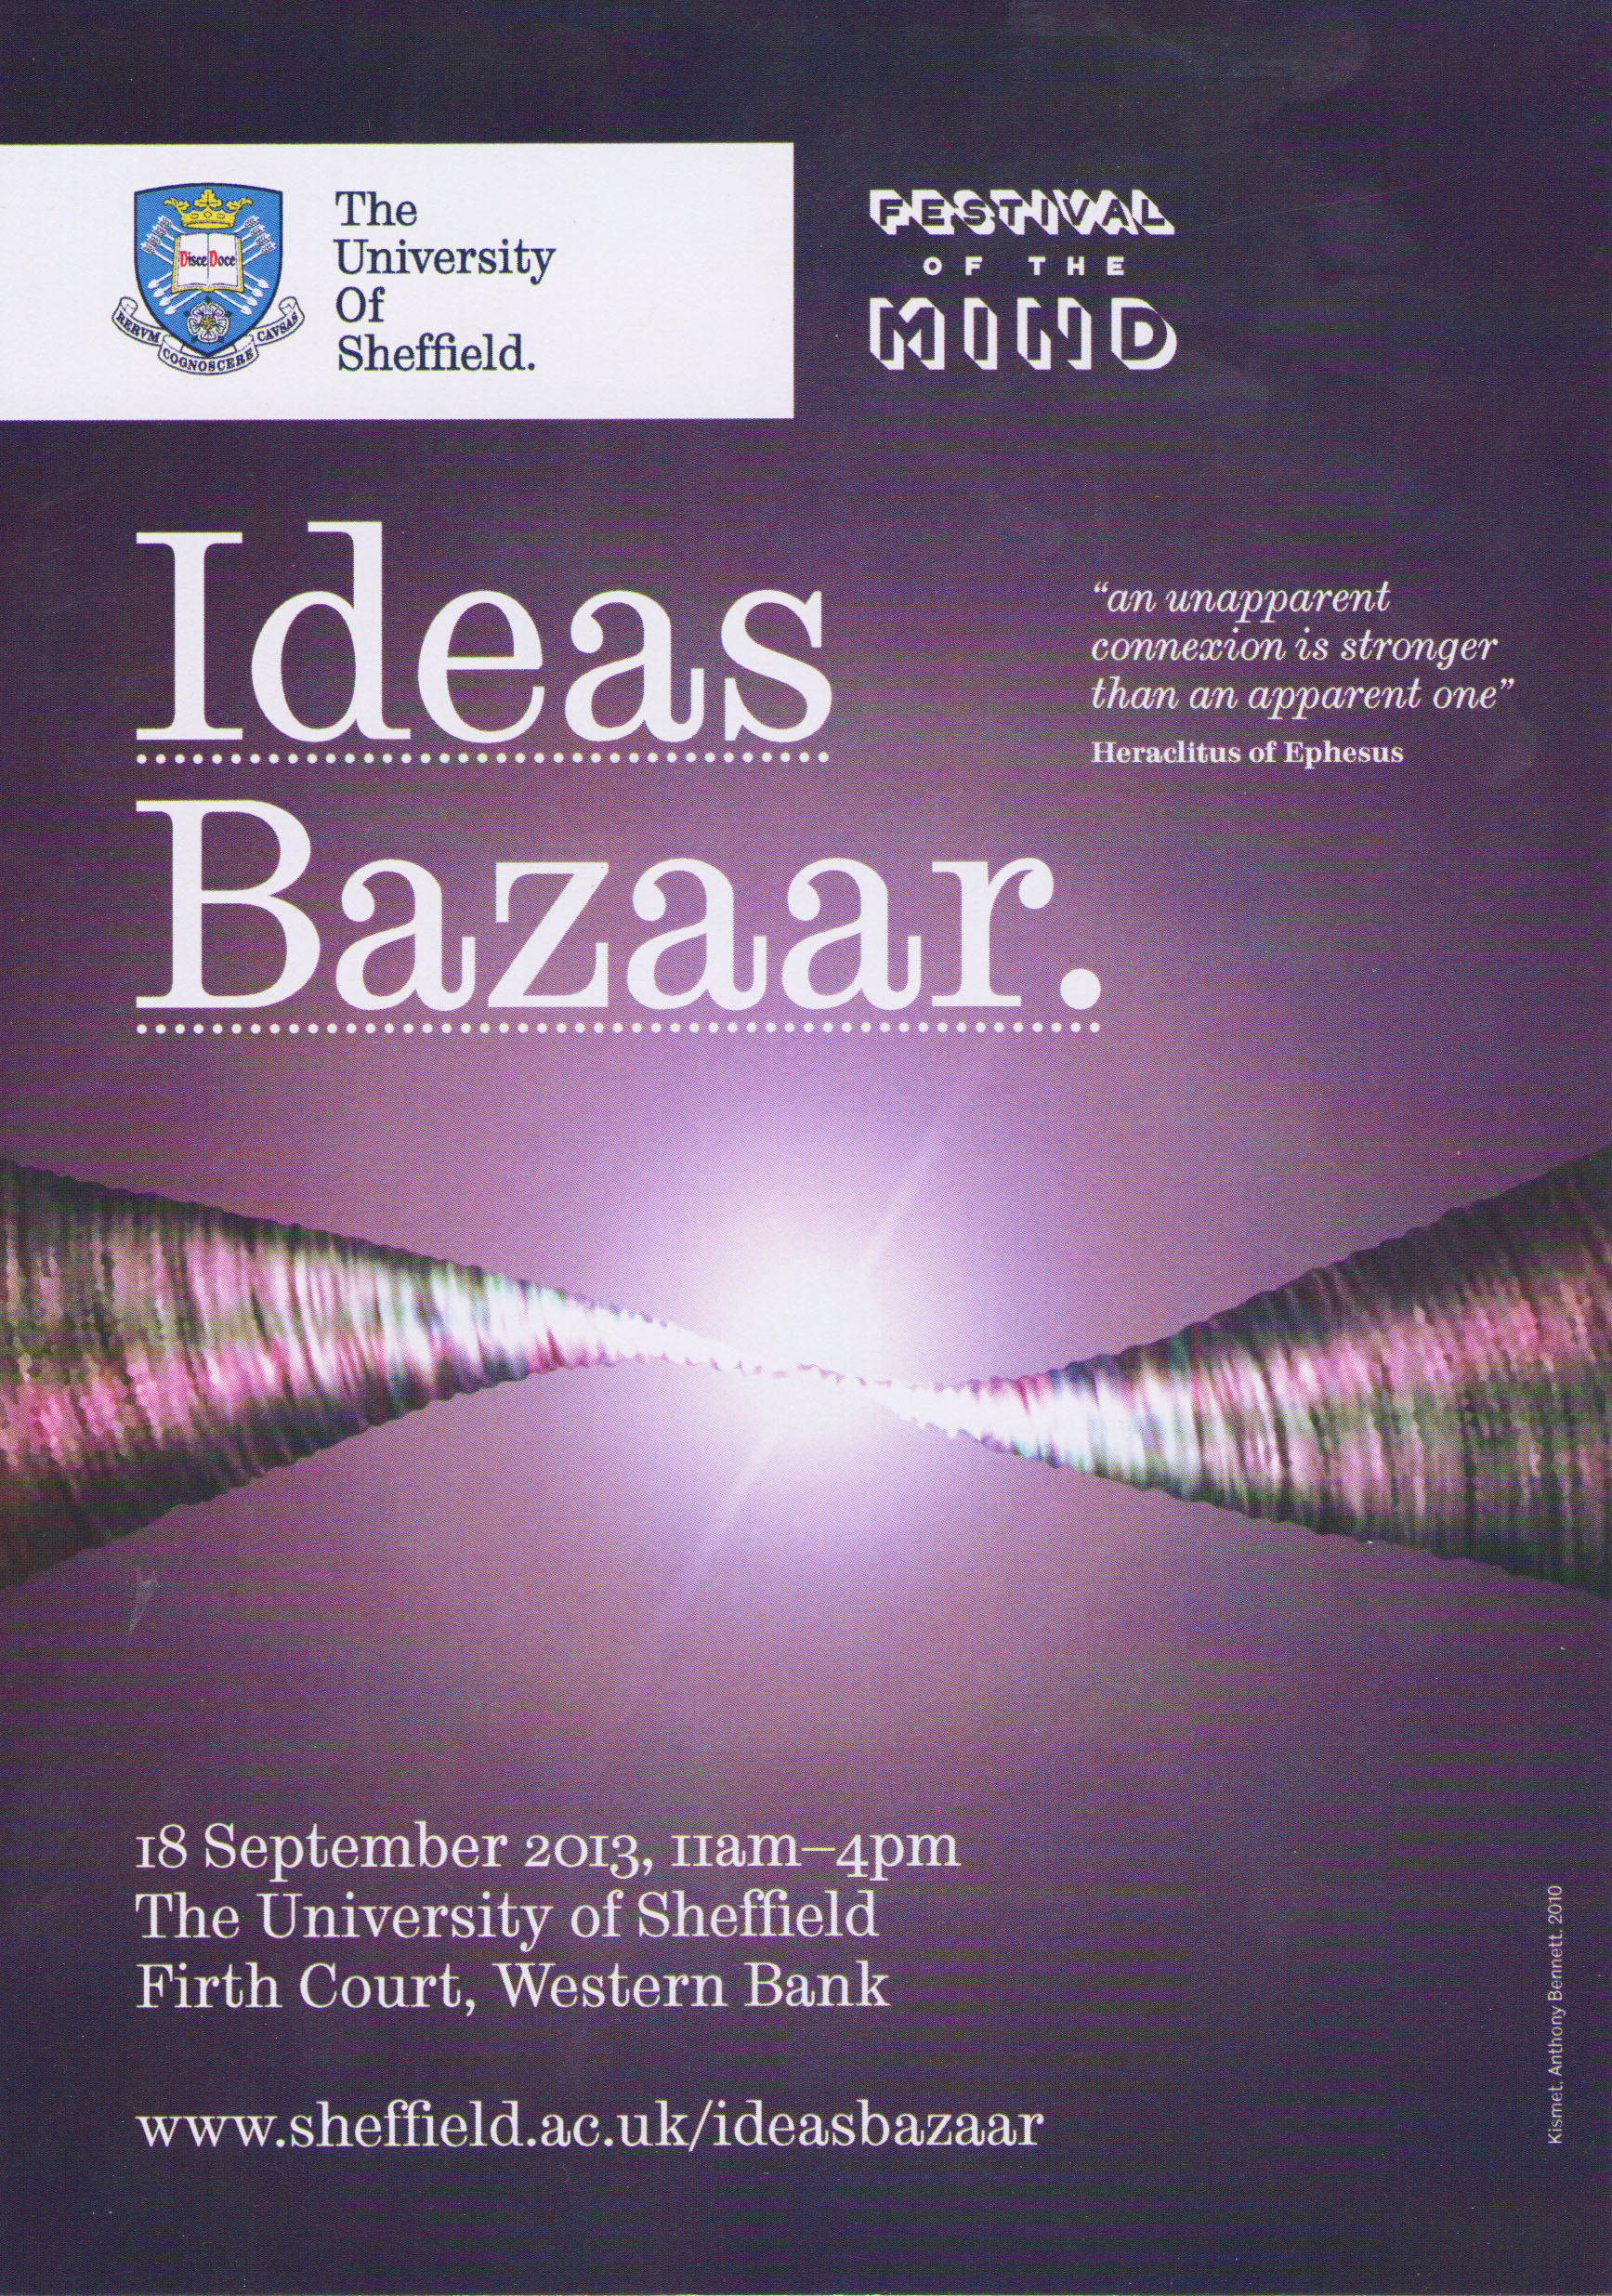 Ideas Bazaar 2013 leaflet